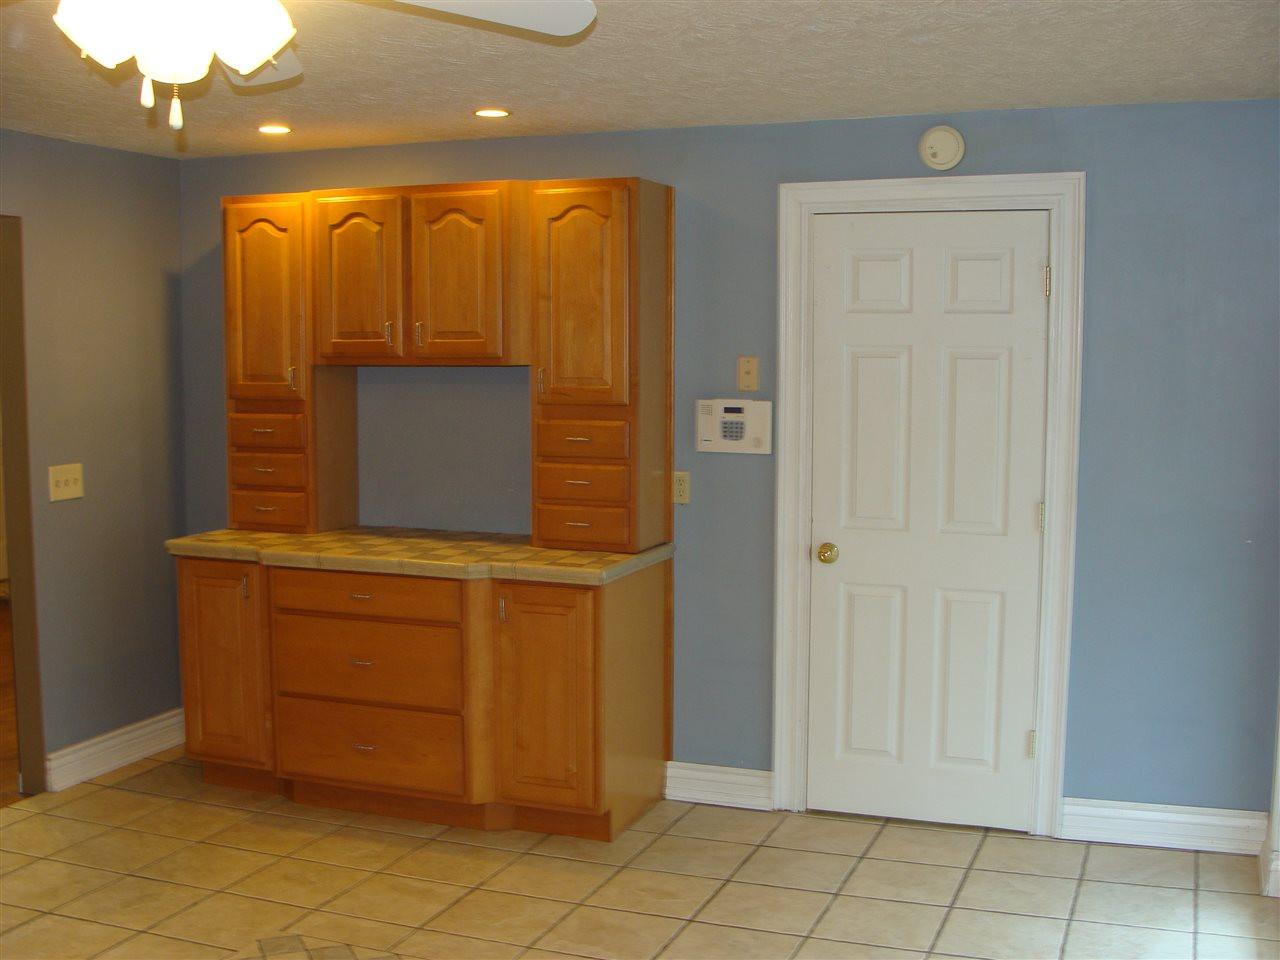 Photo 3 for 21 Elm Wood Ct Alexandria, KY 41001